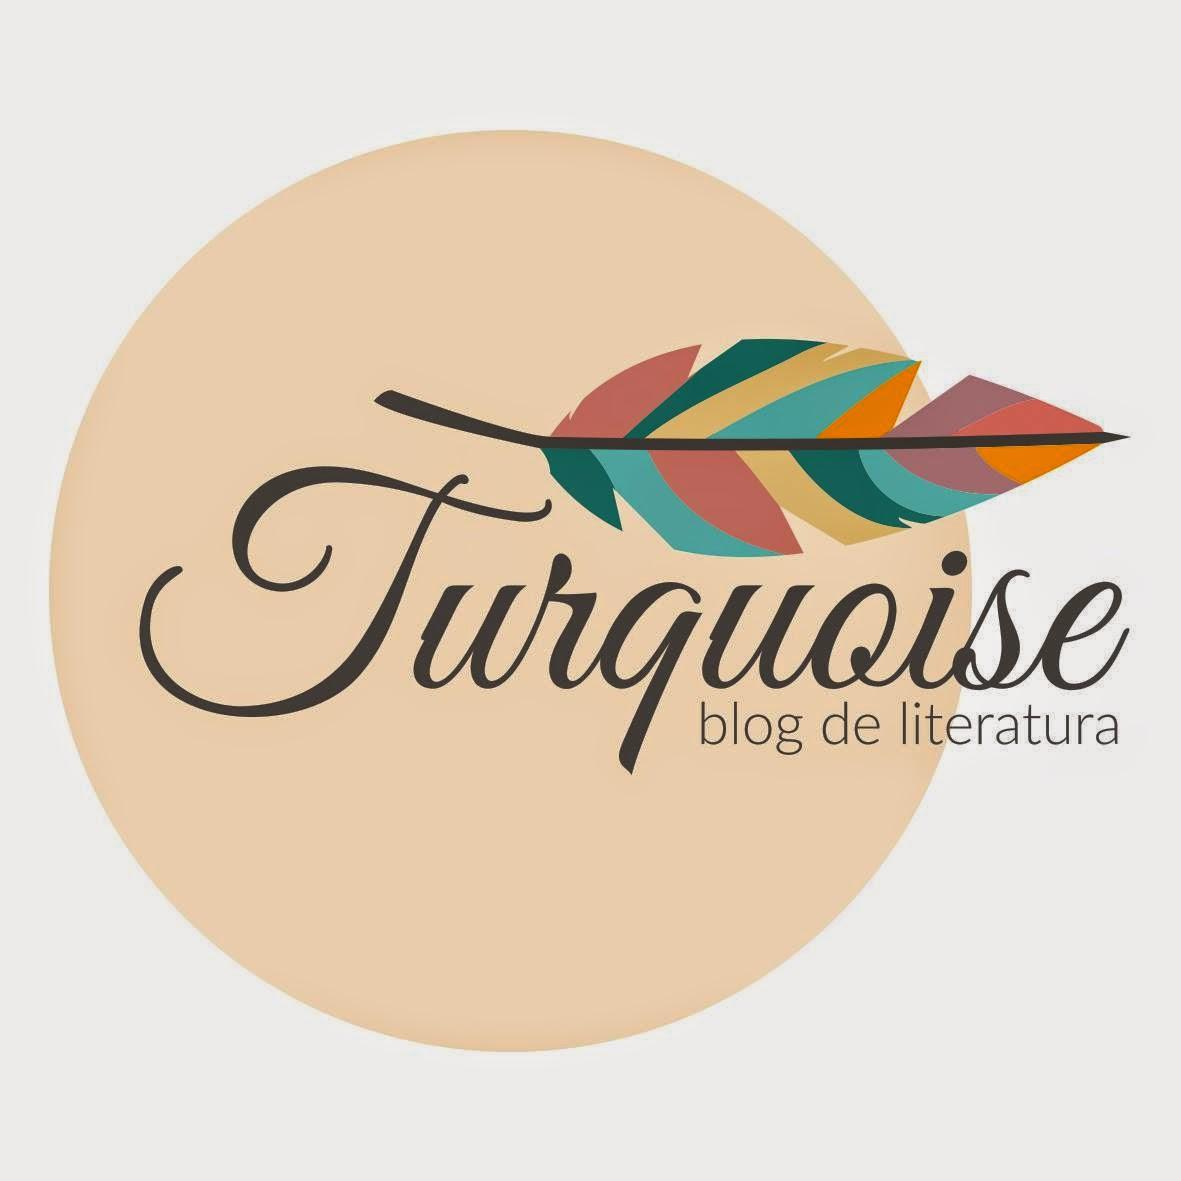 Ahijada "Anna Porcel y su blog "Turquoise"